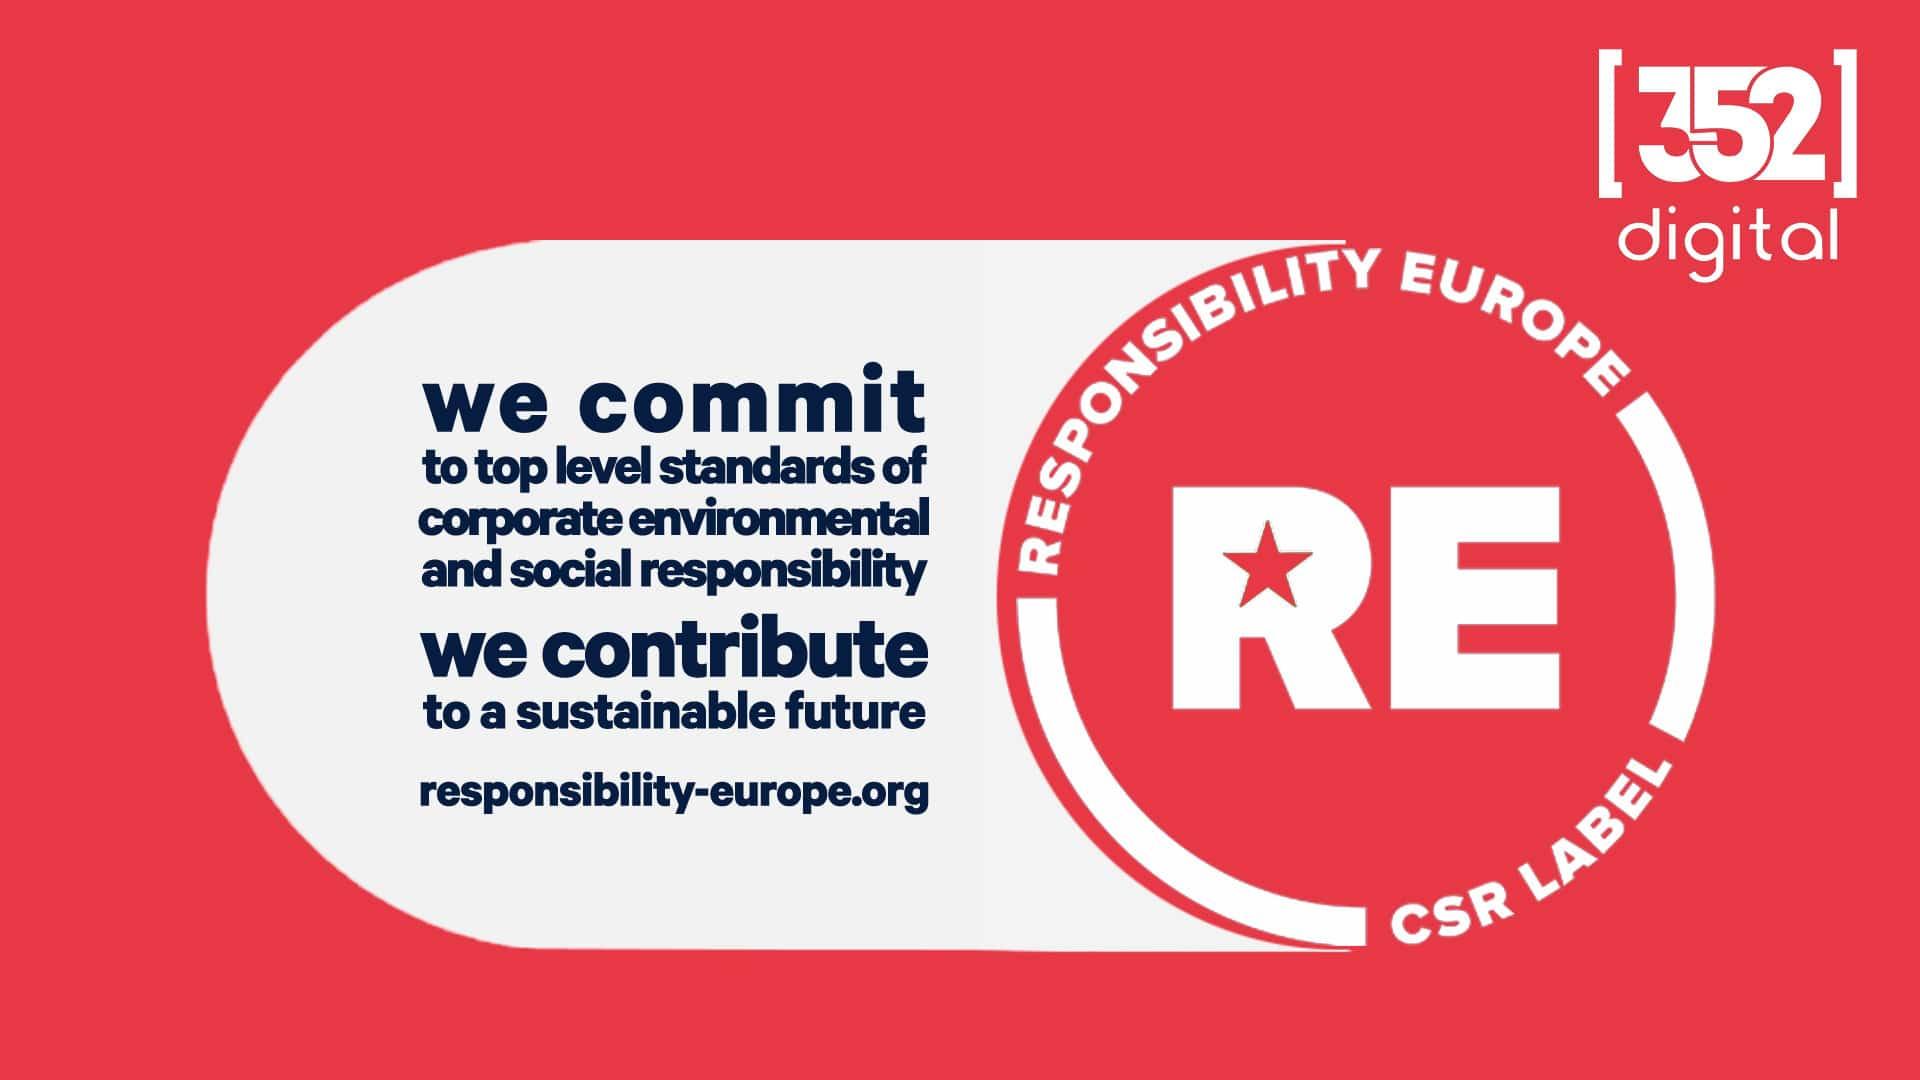 Responsible Europe Accreditation